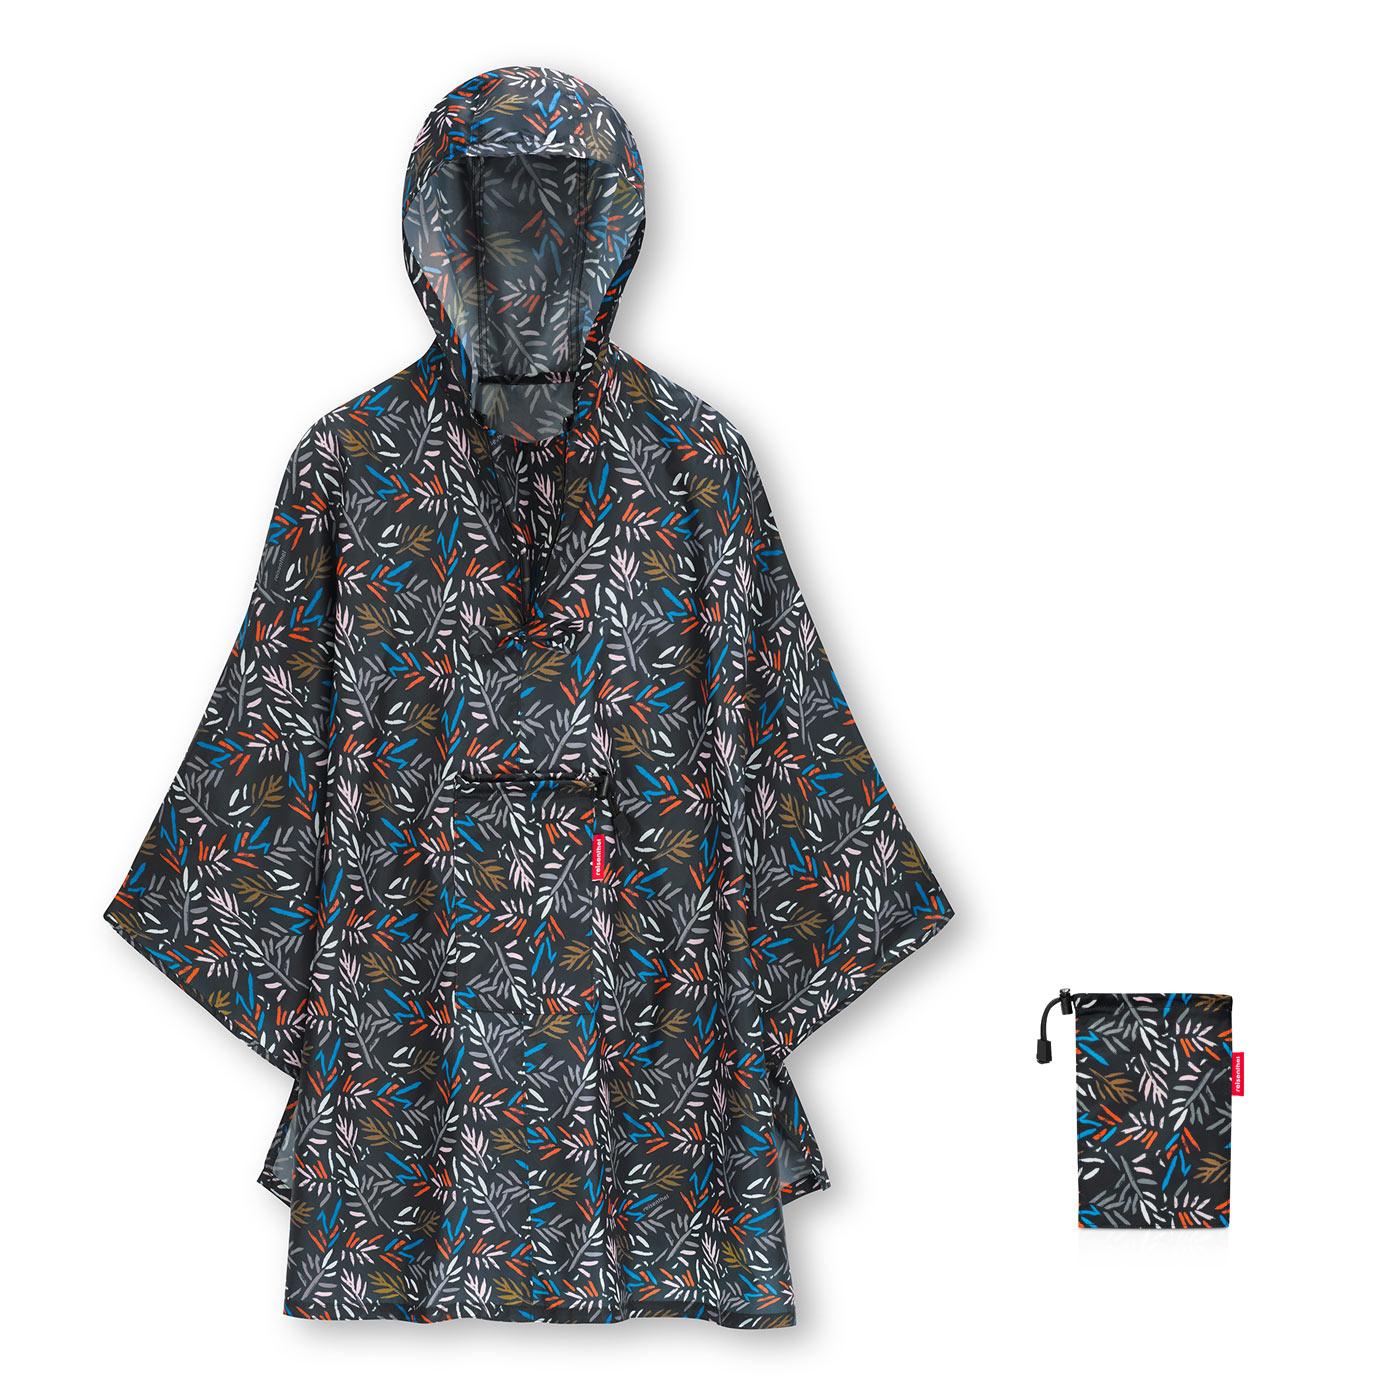 Reisenthel capa chuva desdobravel mini maxi poncho Autumm